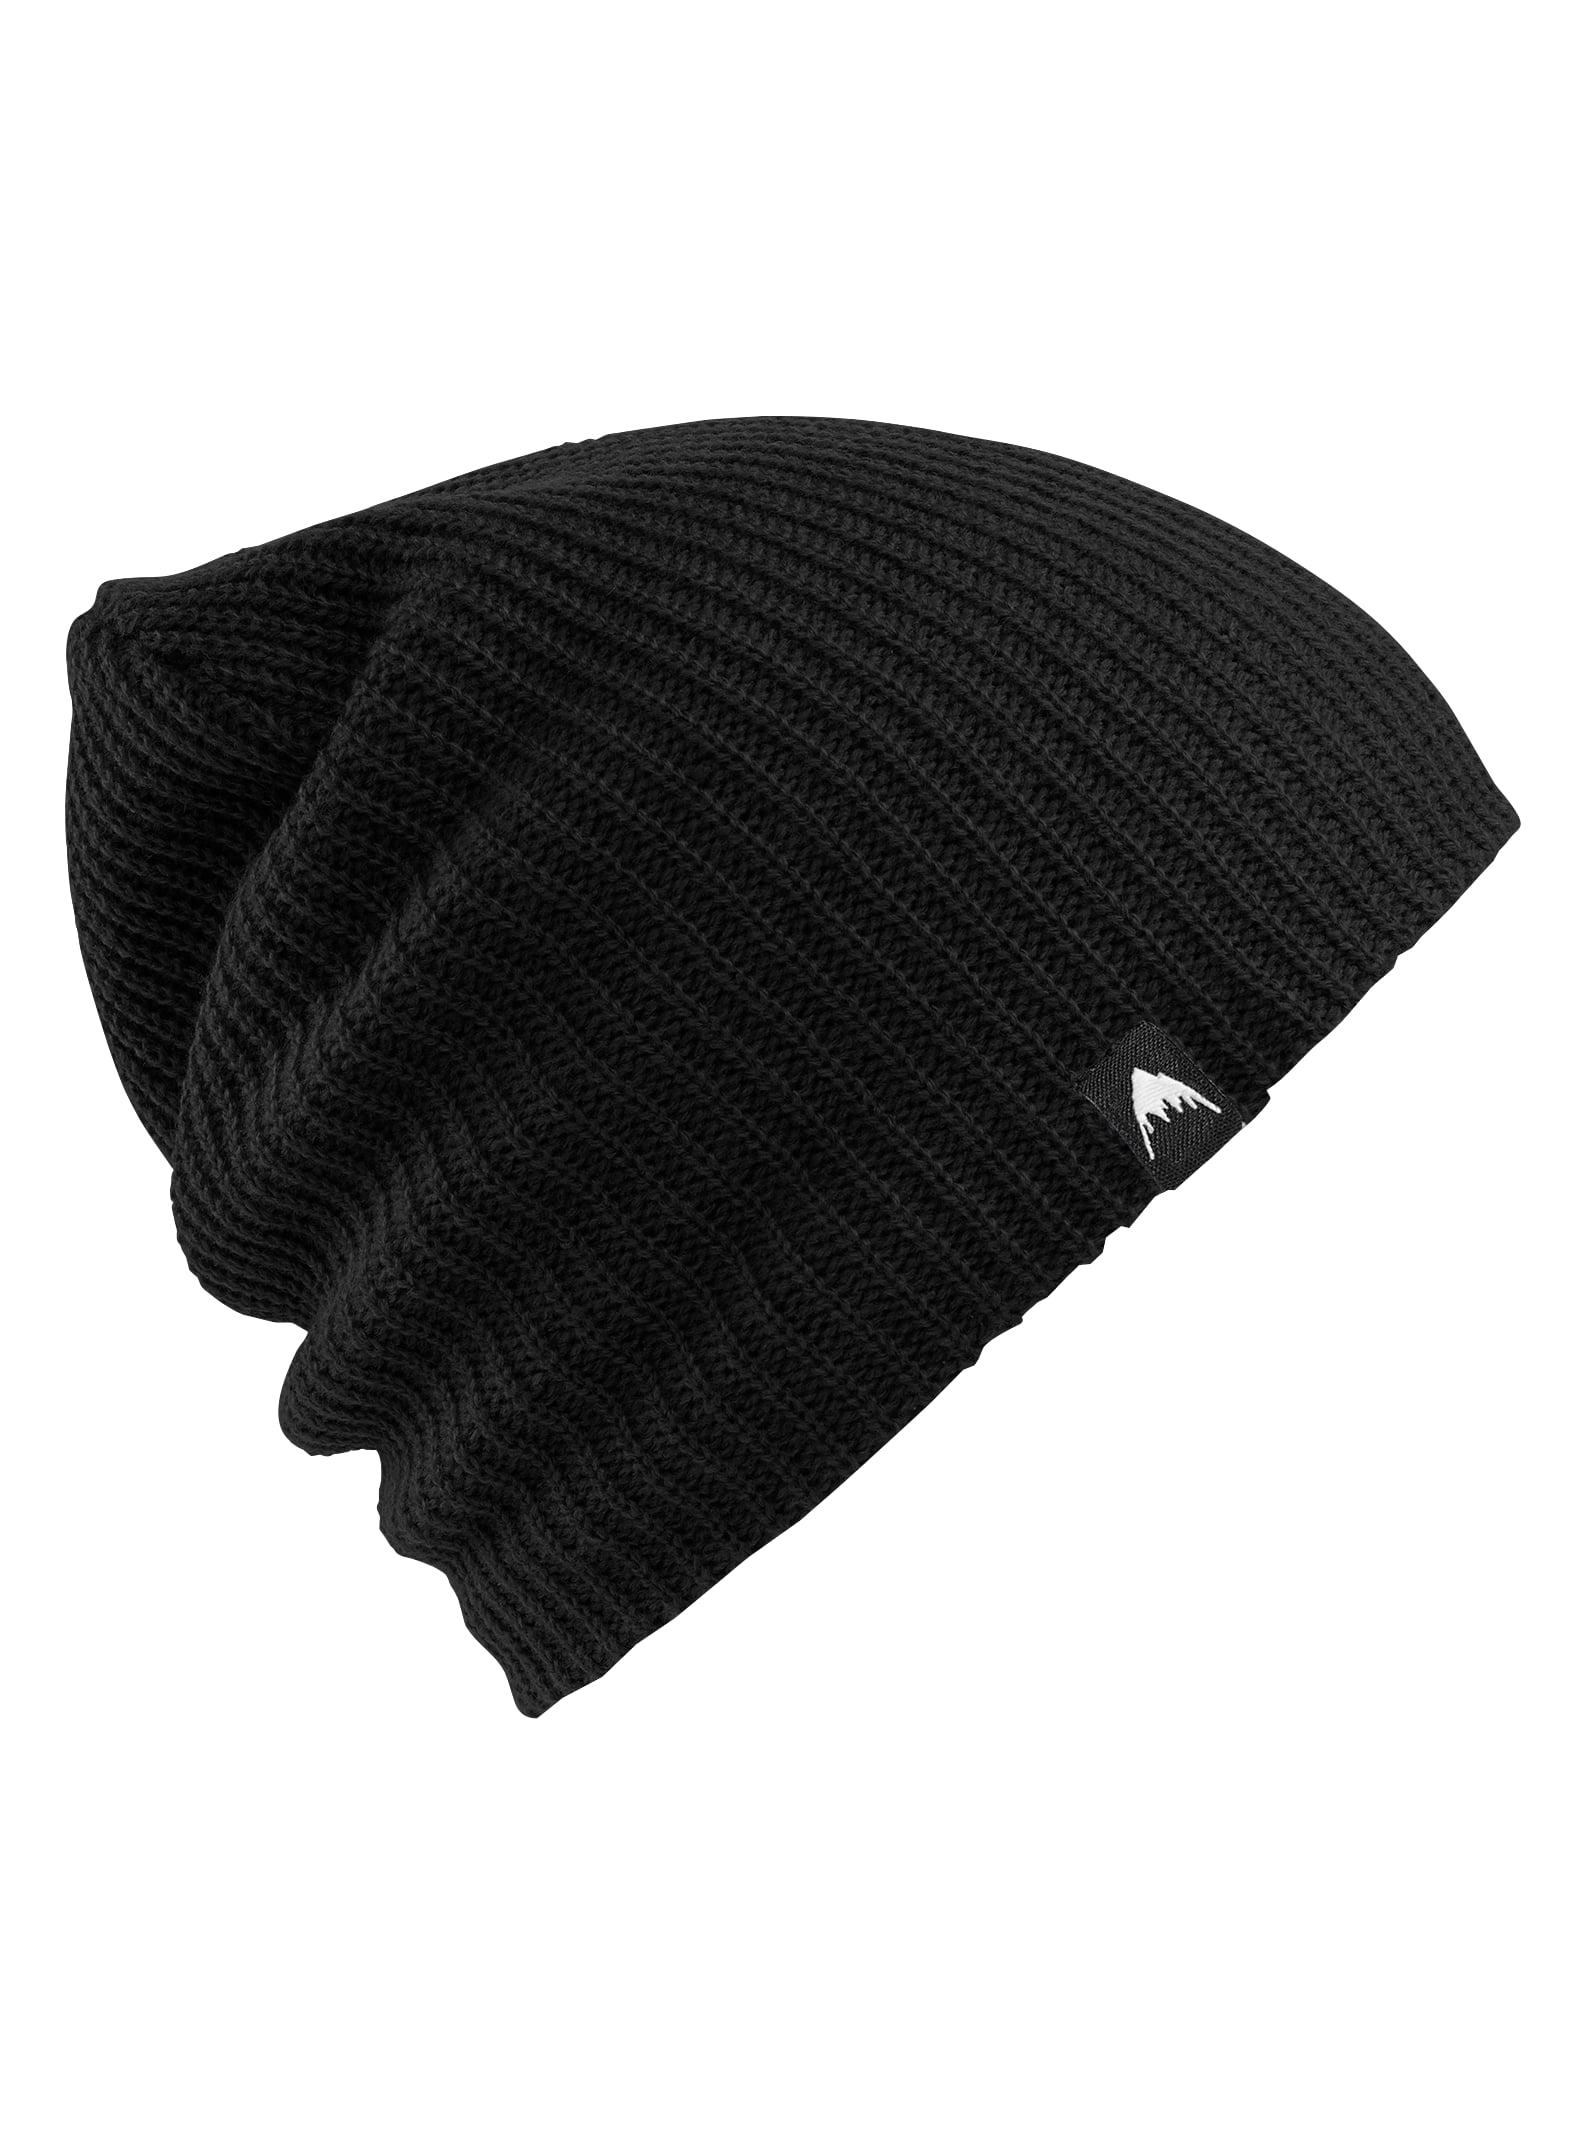 10aa7257cc4 Men s Hats   Beanies